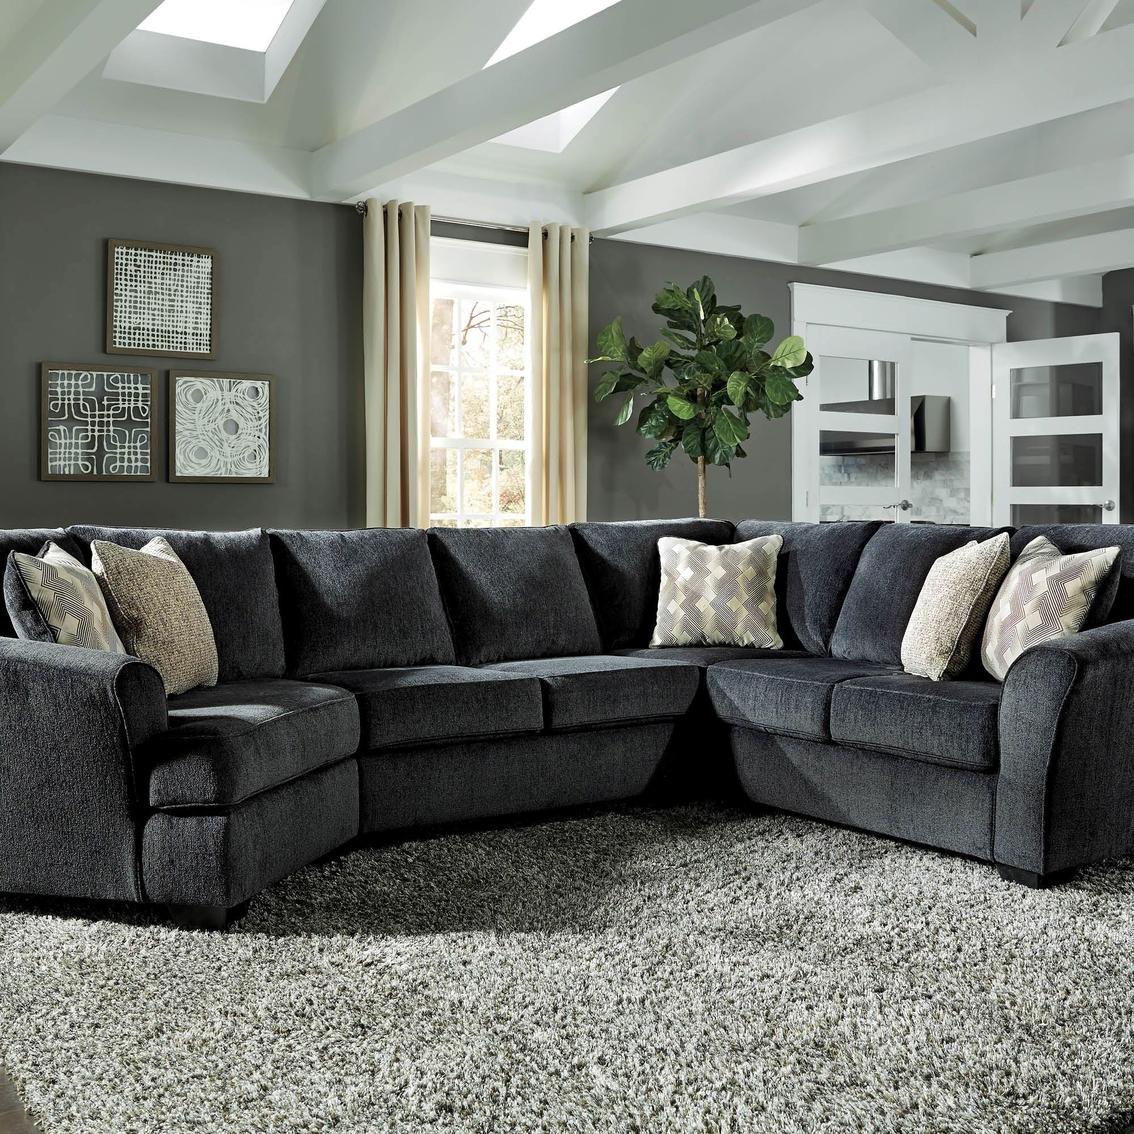 signature design by ashley eltmann 3 pc sectional laf cuddler loveseat raf sofa